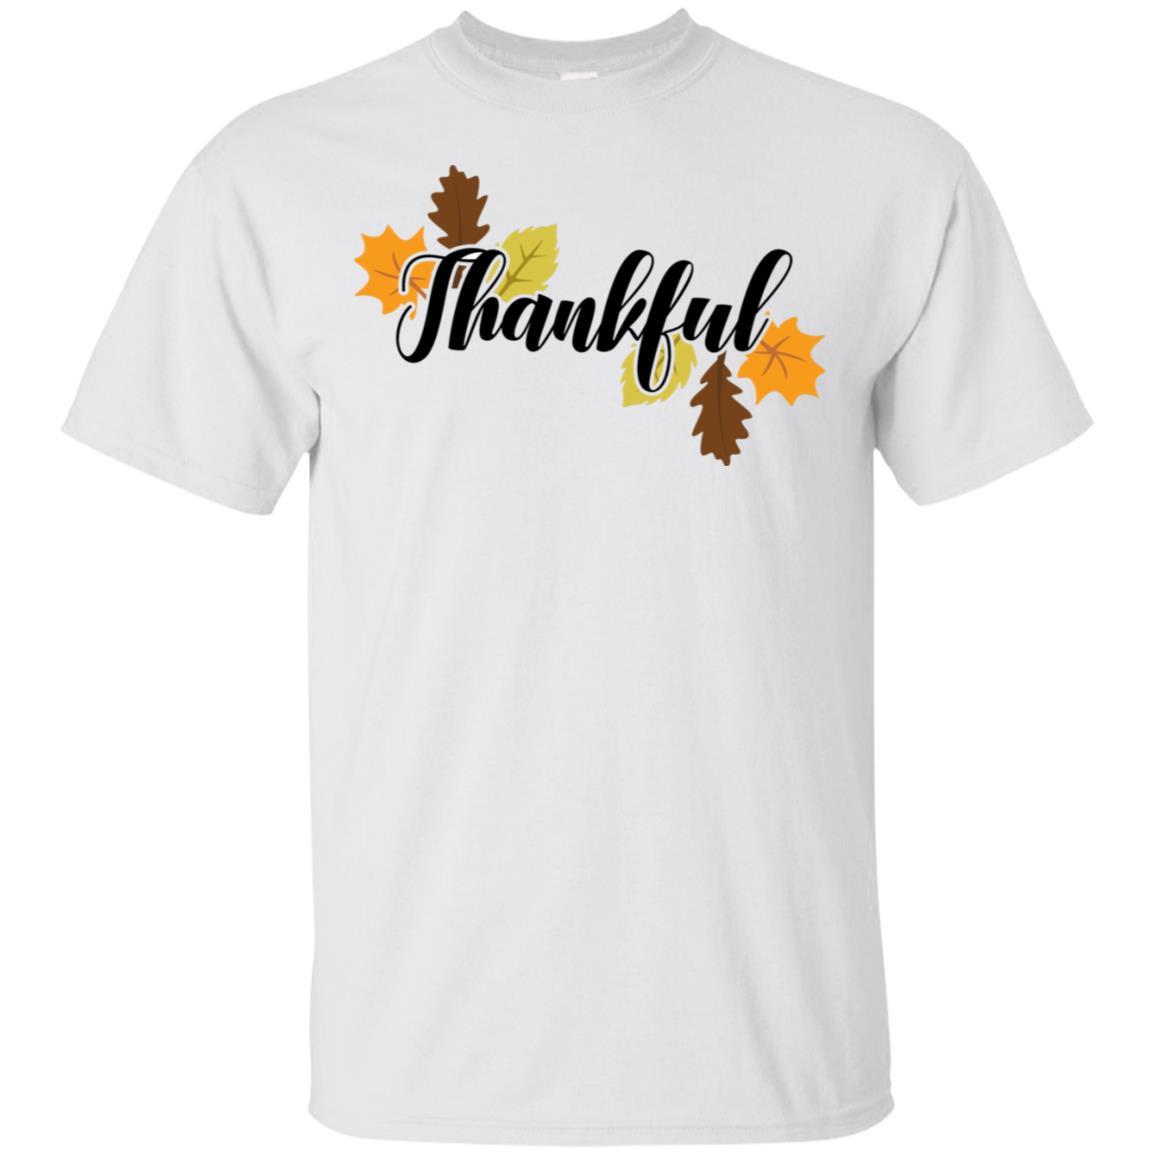 Thanksgiving Autumn Leaves Holiday Gift Women Unisex Short Sleeve